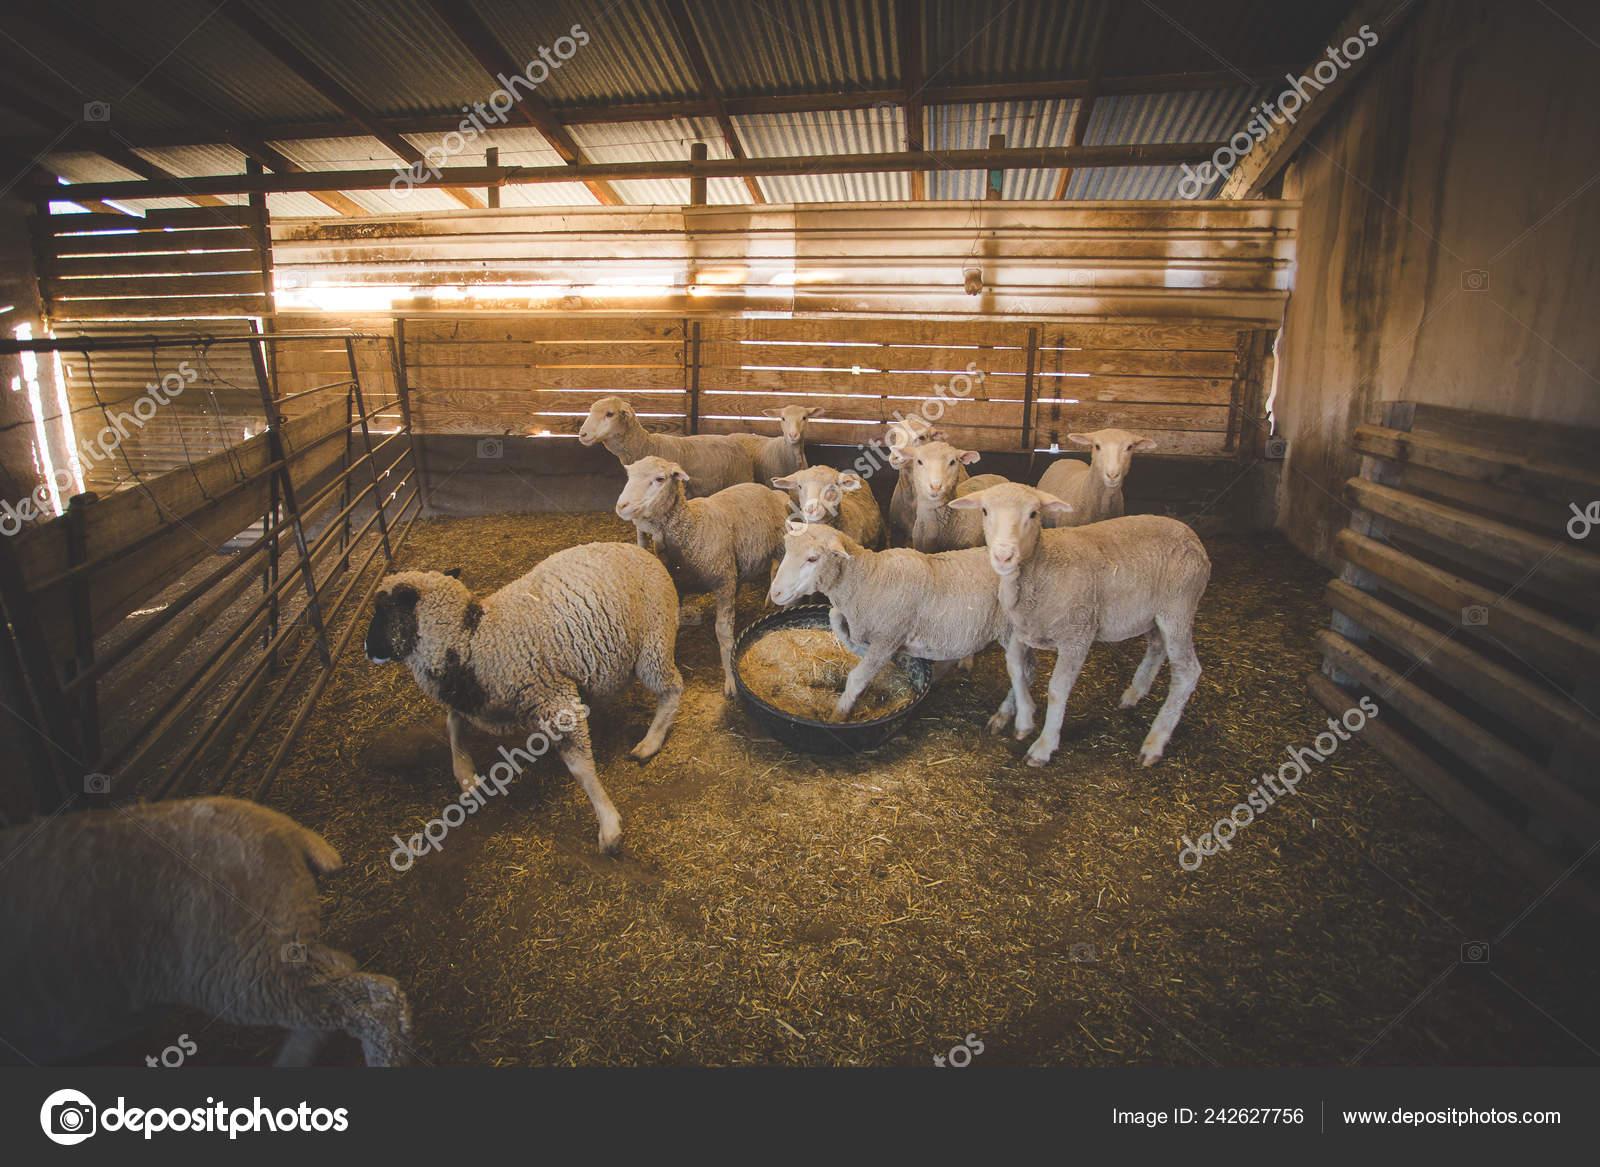 Close Image Merino Sheep Shed Karoo Region South Africa Getting Stock Photo C Dewald Dewaldkirsten 242627756